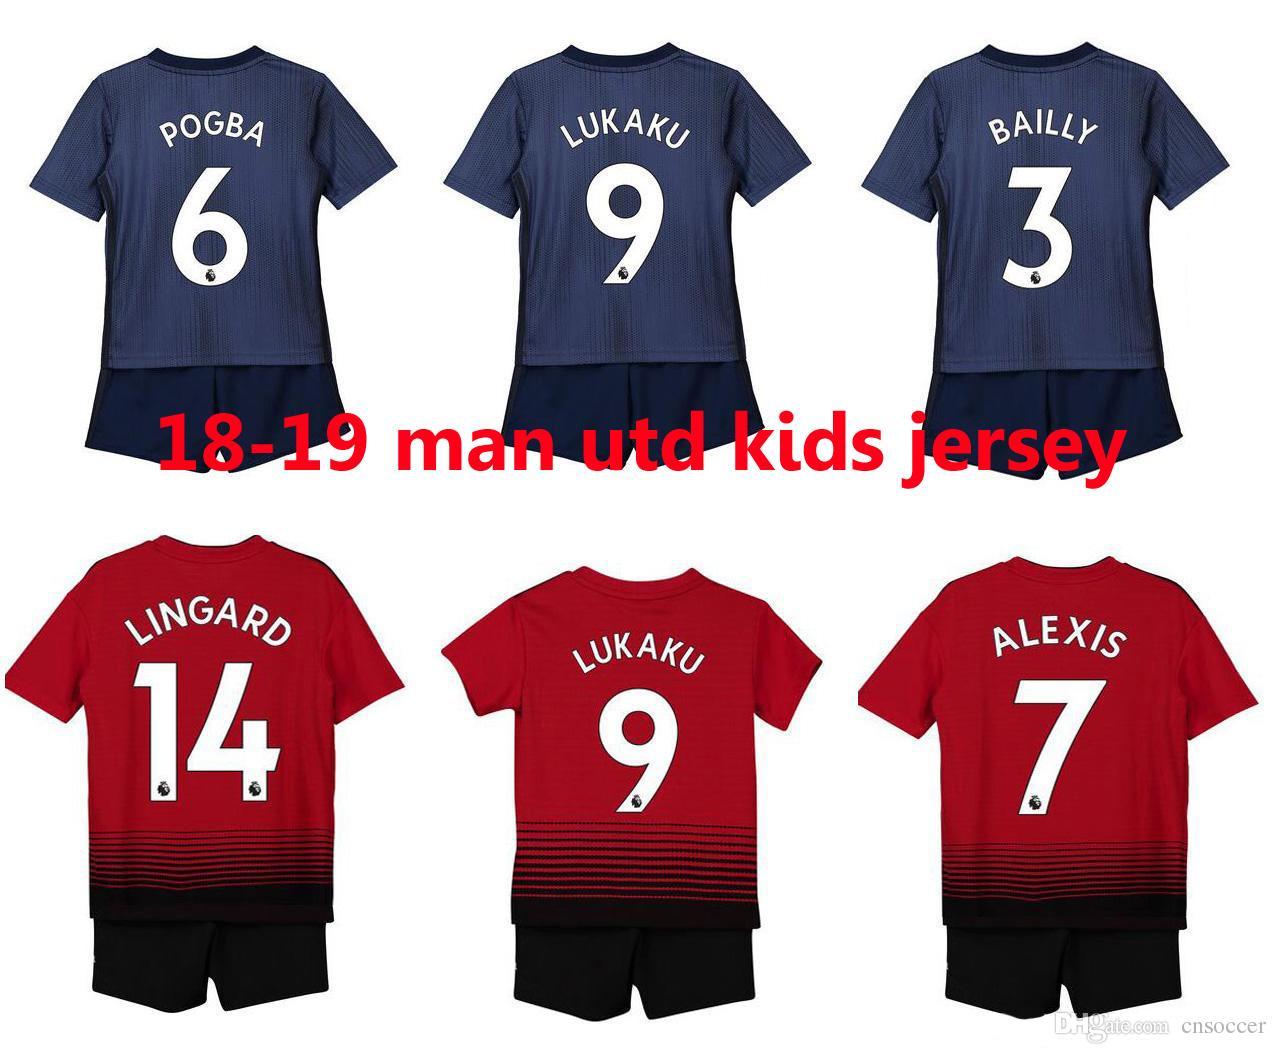 huge discount bc006 ec18c Manchester united kids kit man utd kids soccer jersey Top-qualität 2019  Alexis jugend Mata jersey Kinder Fußball kits Maillot de Fuß vereint set ...